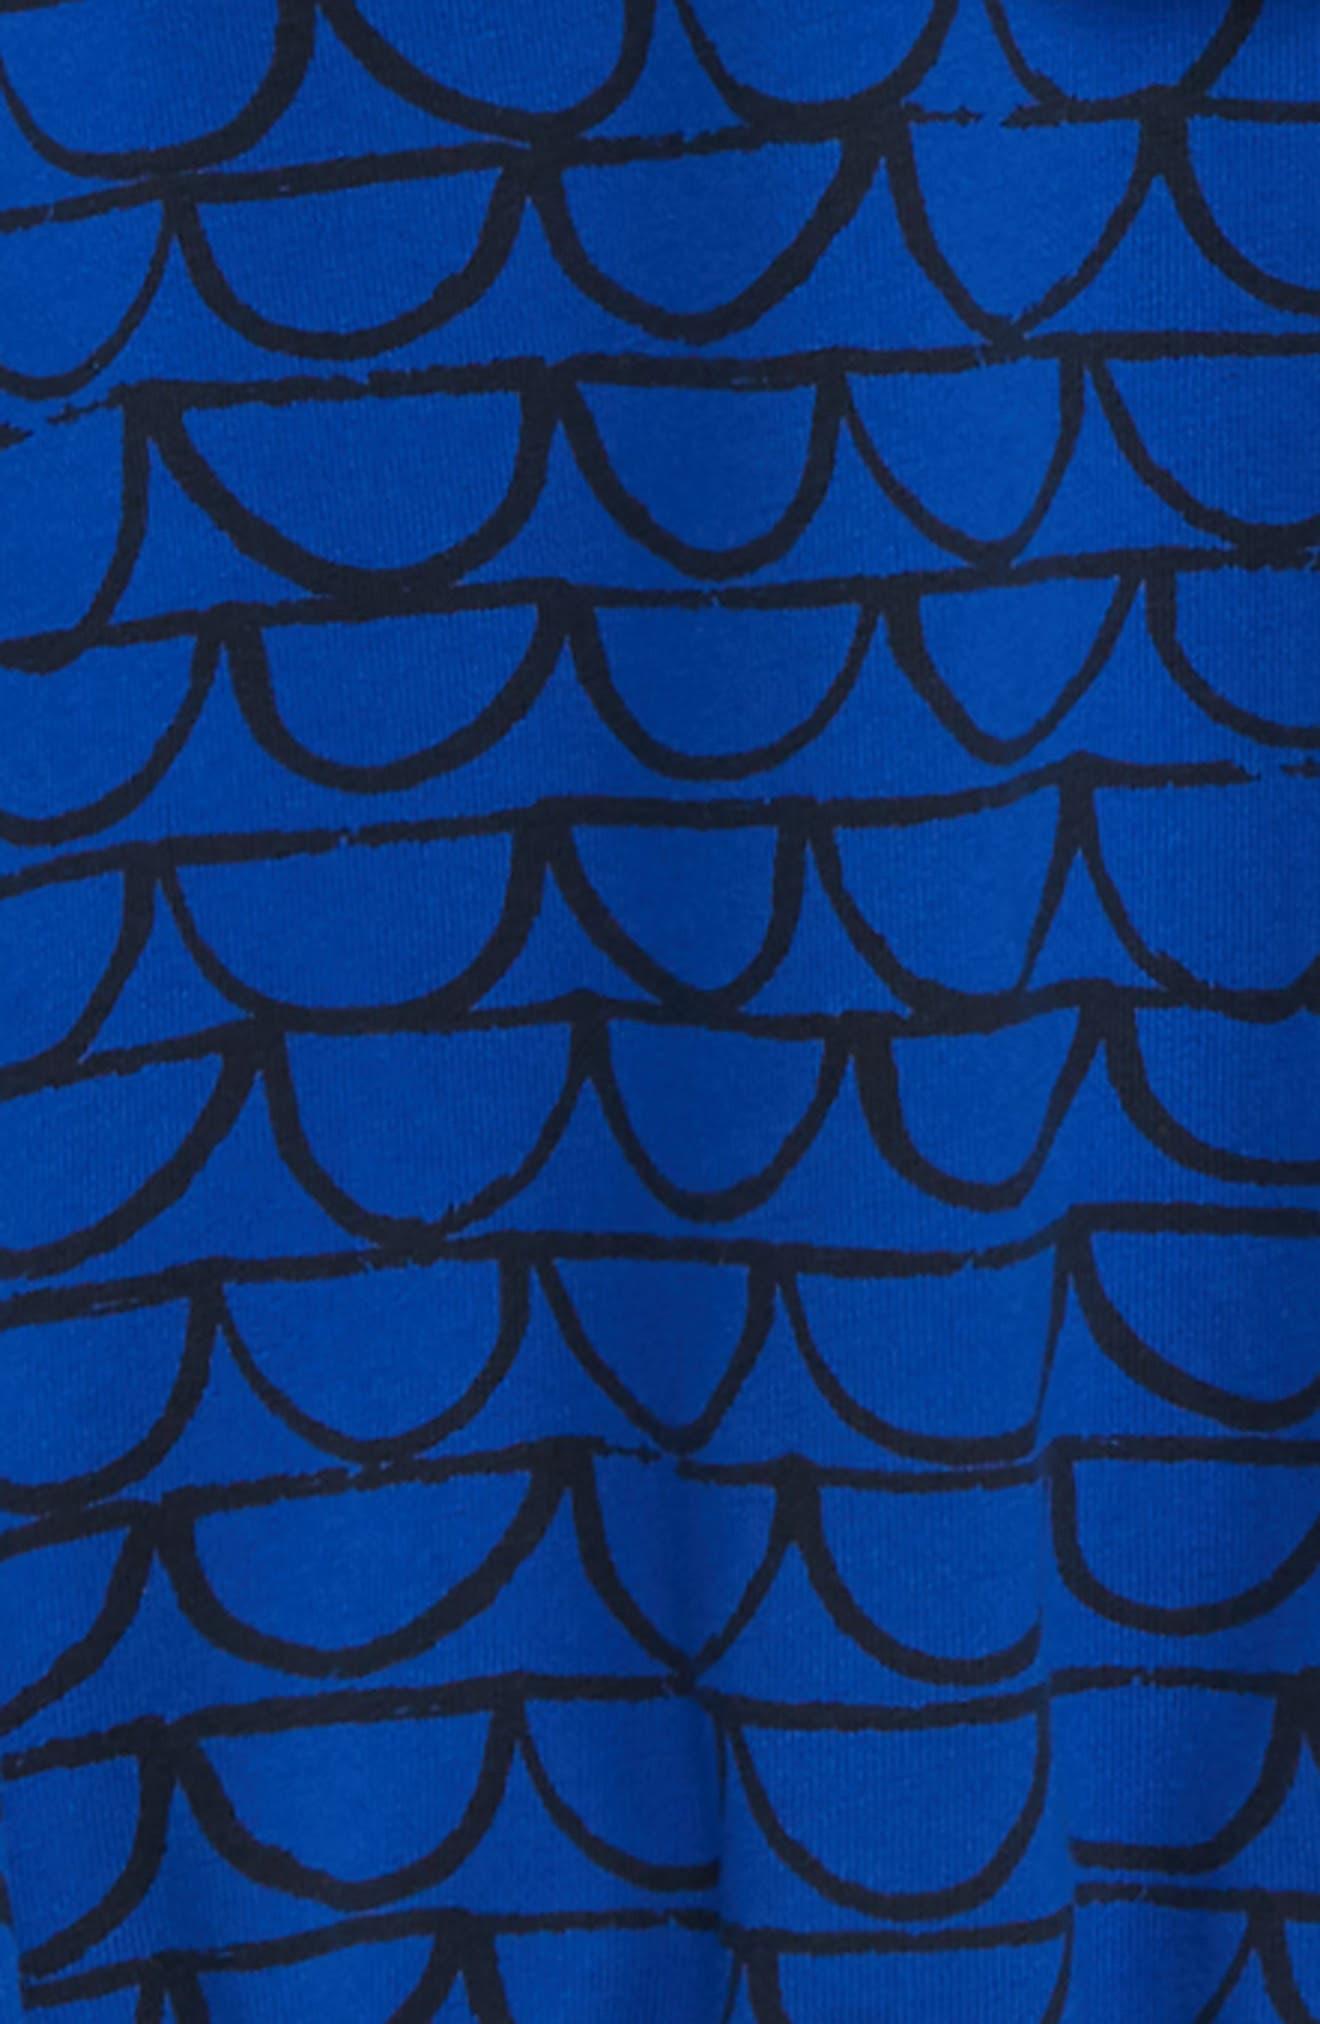 Ruffle Top,                             Alternate thumbnail 2, color,                             BLUE MAZARINE SCALLOPS